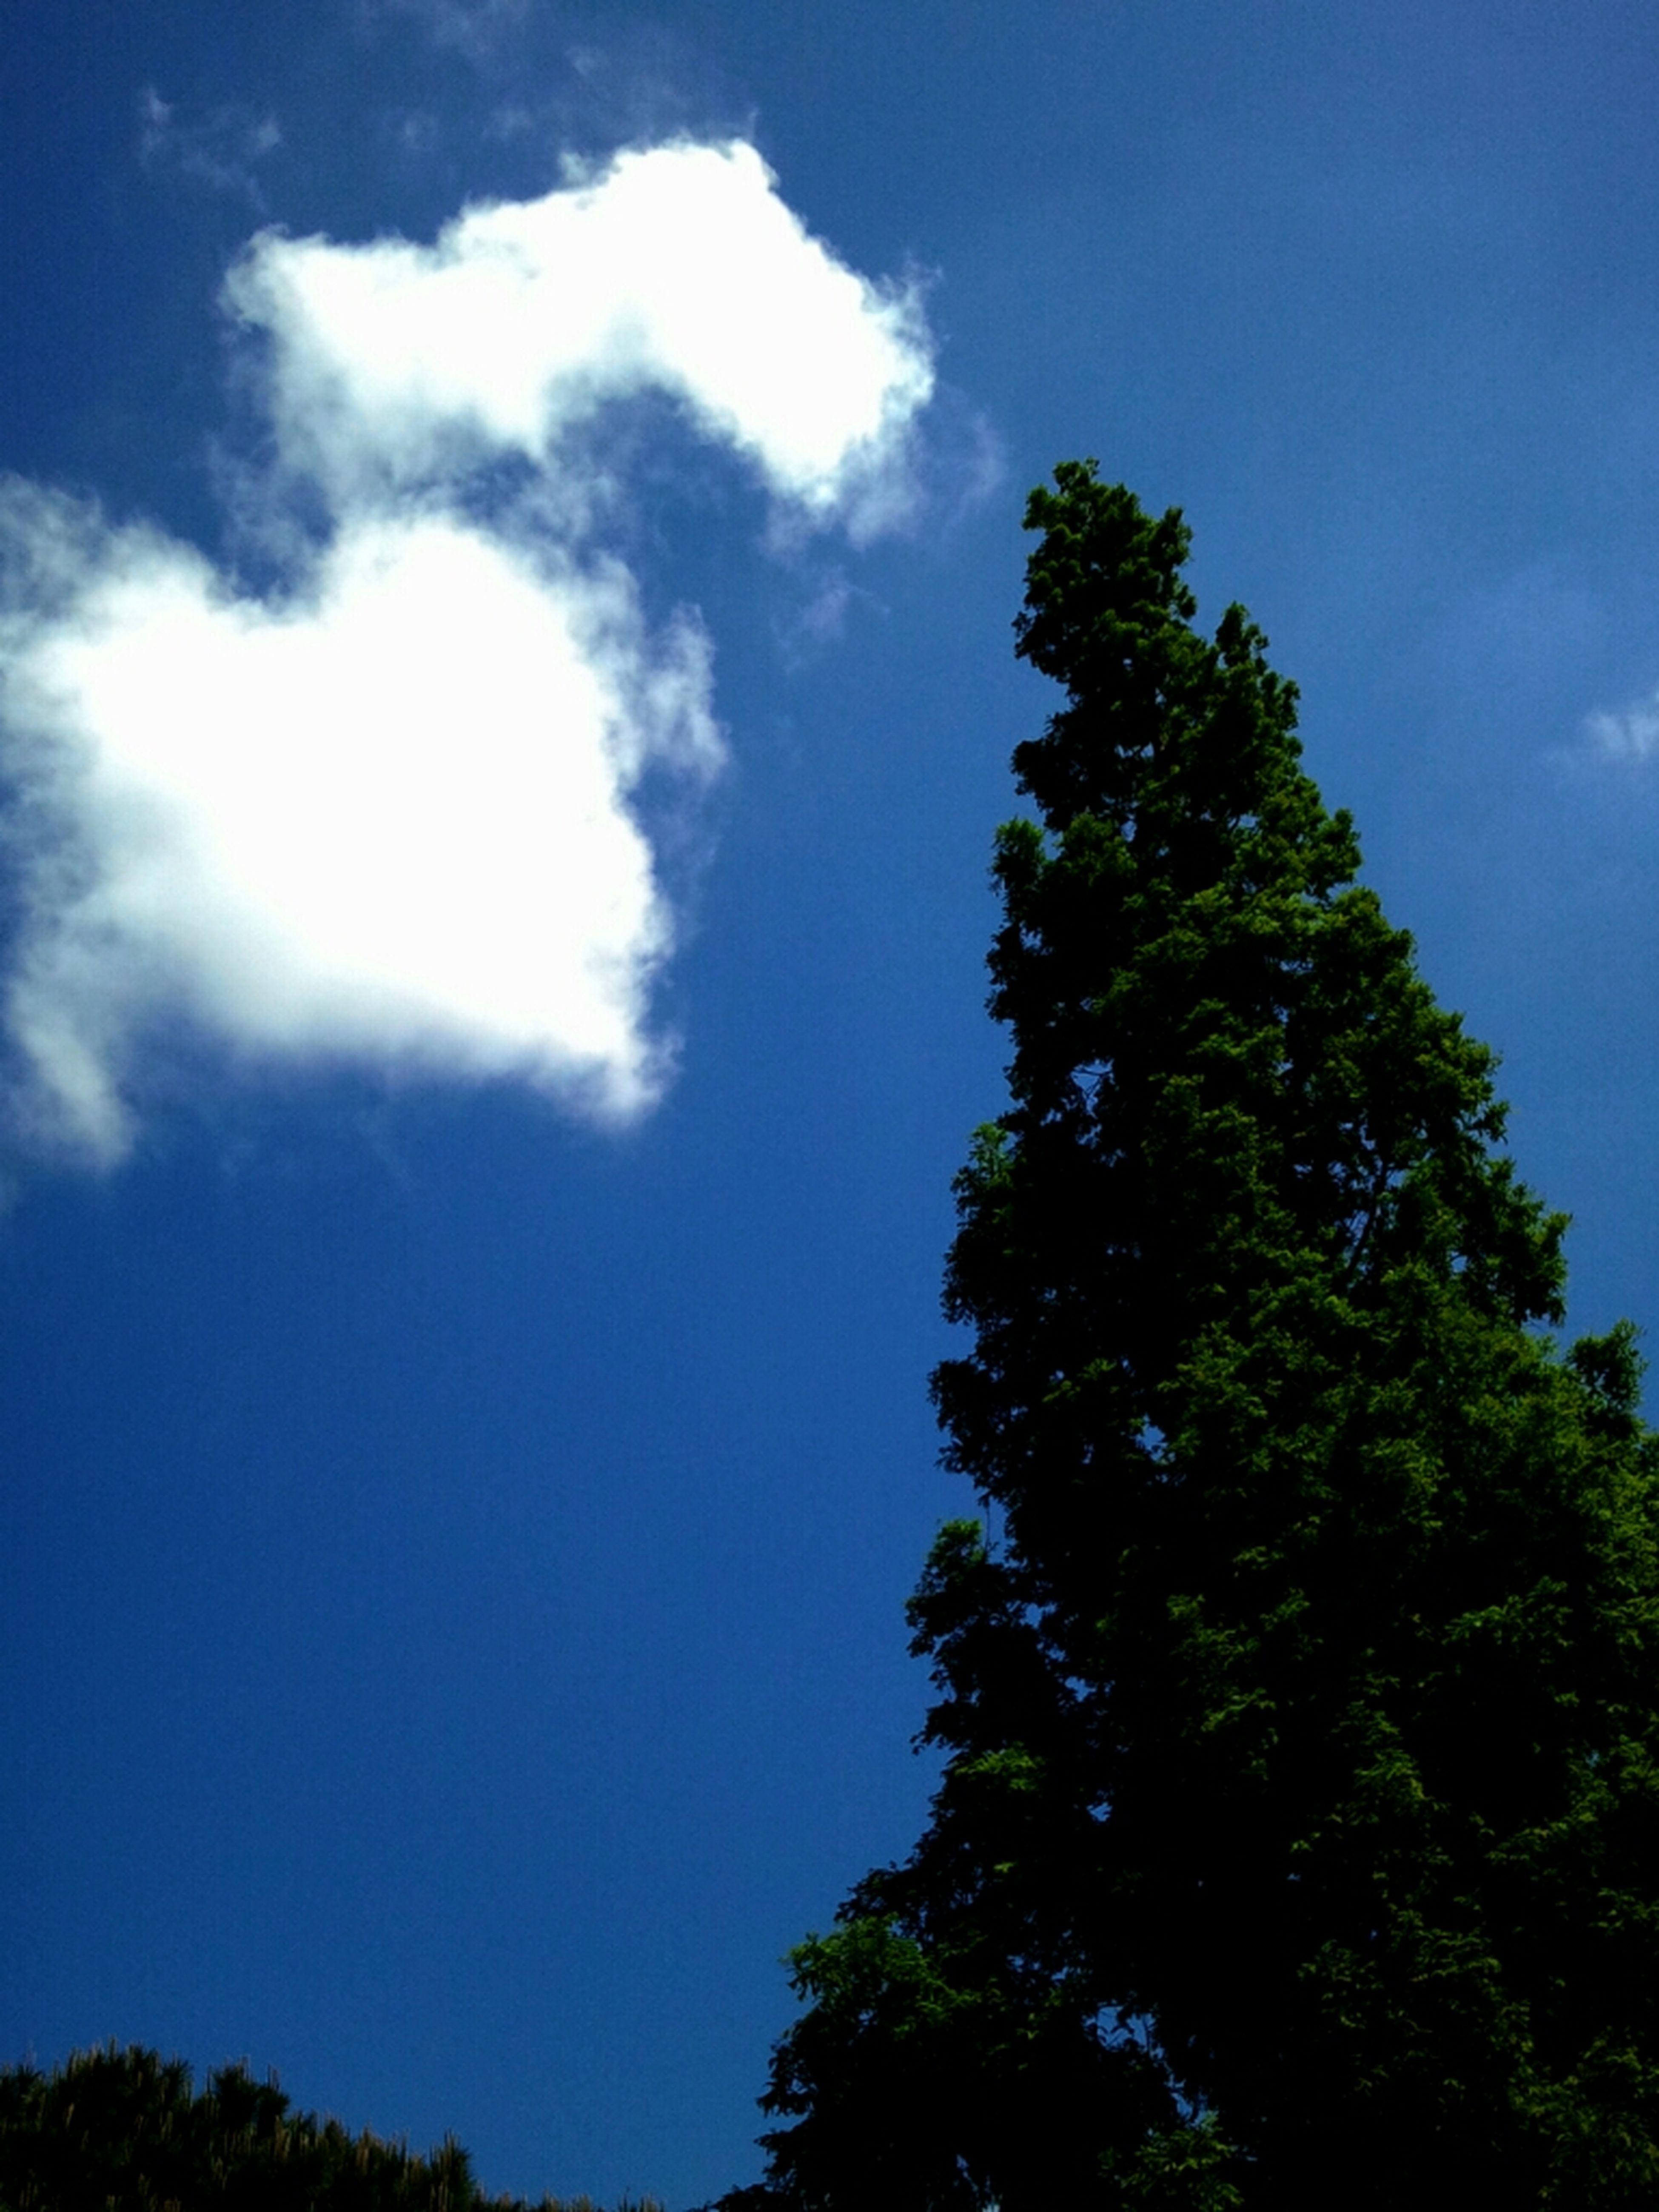 Cloud In The Shape Of Heart